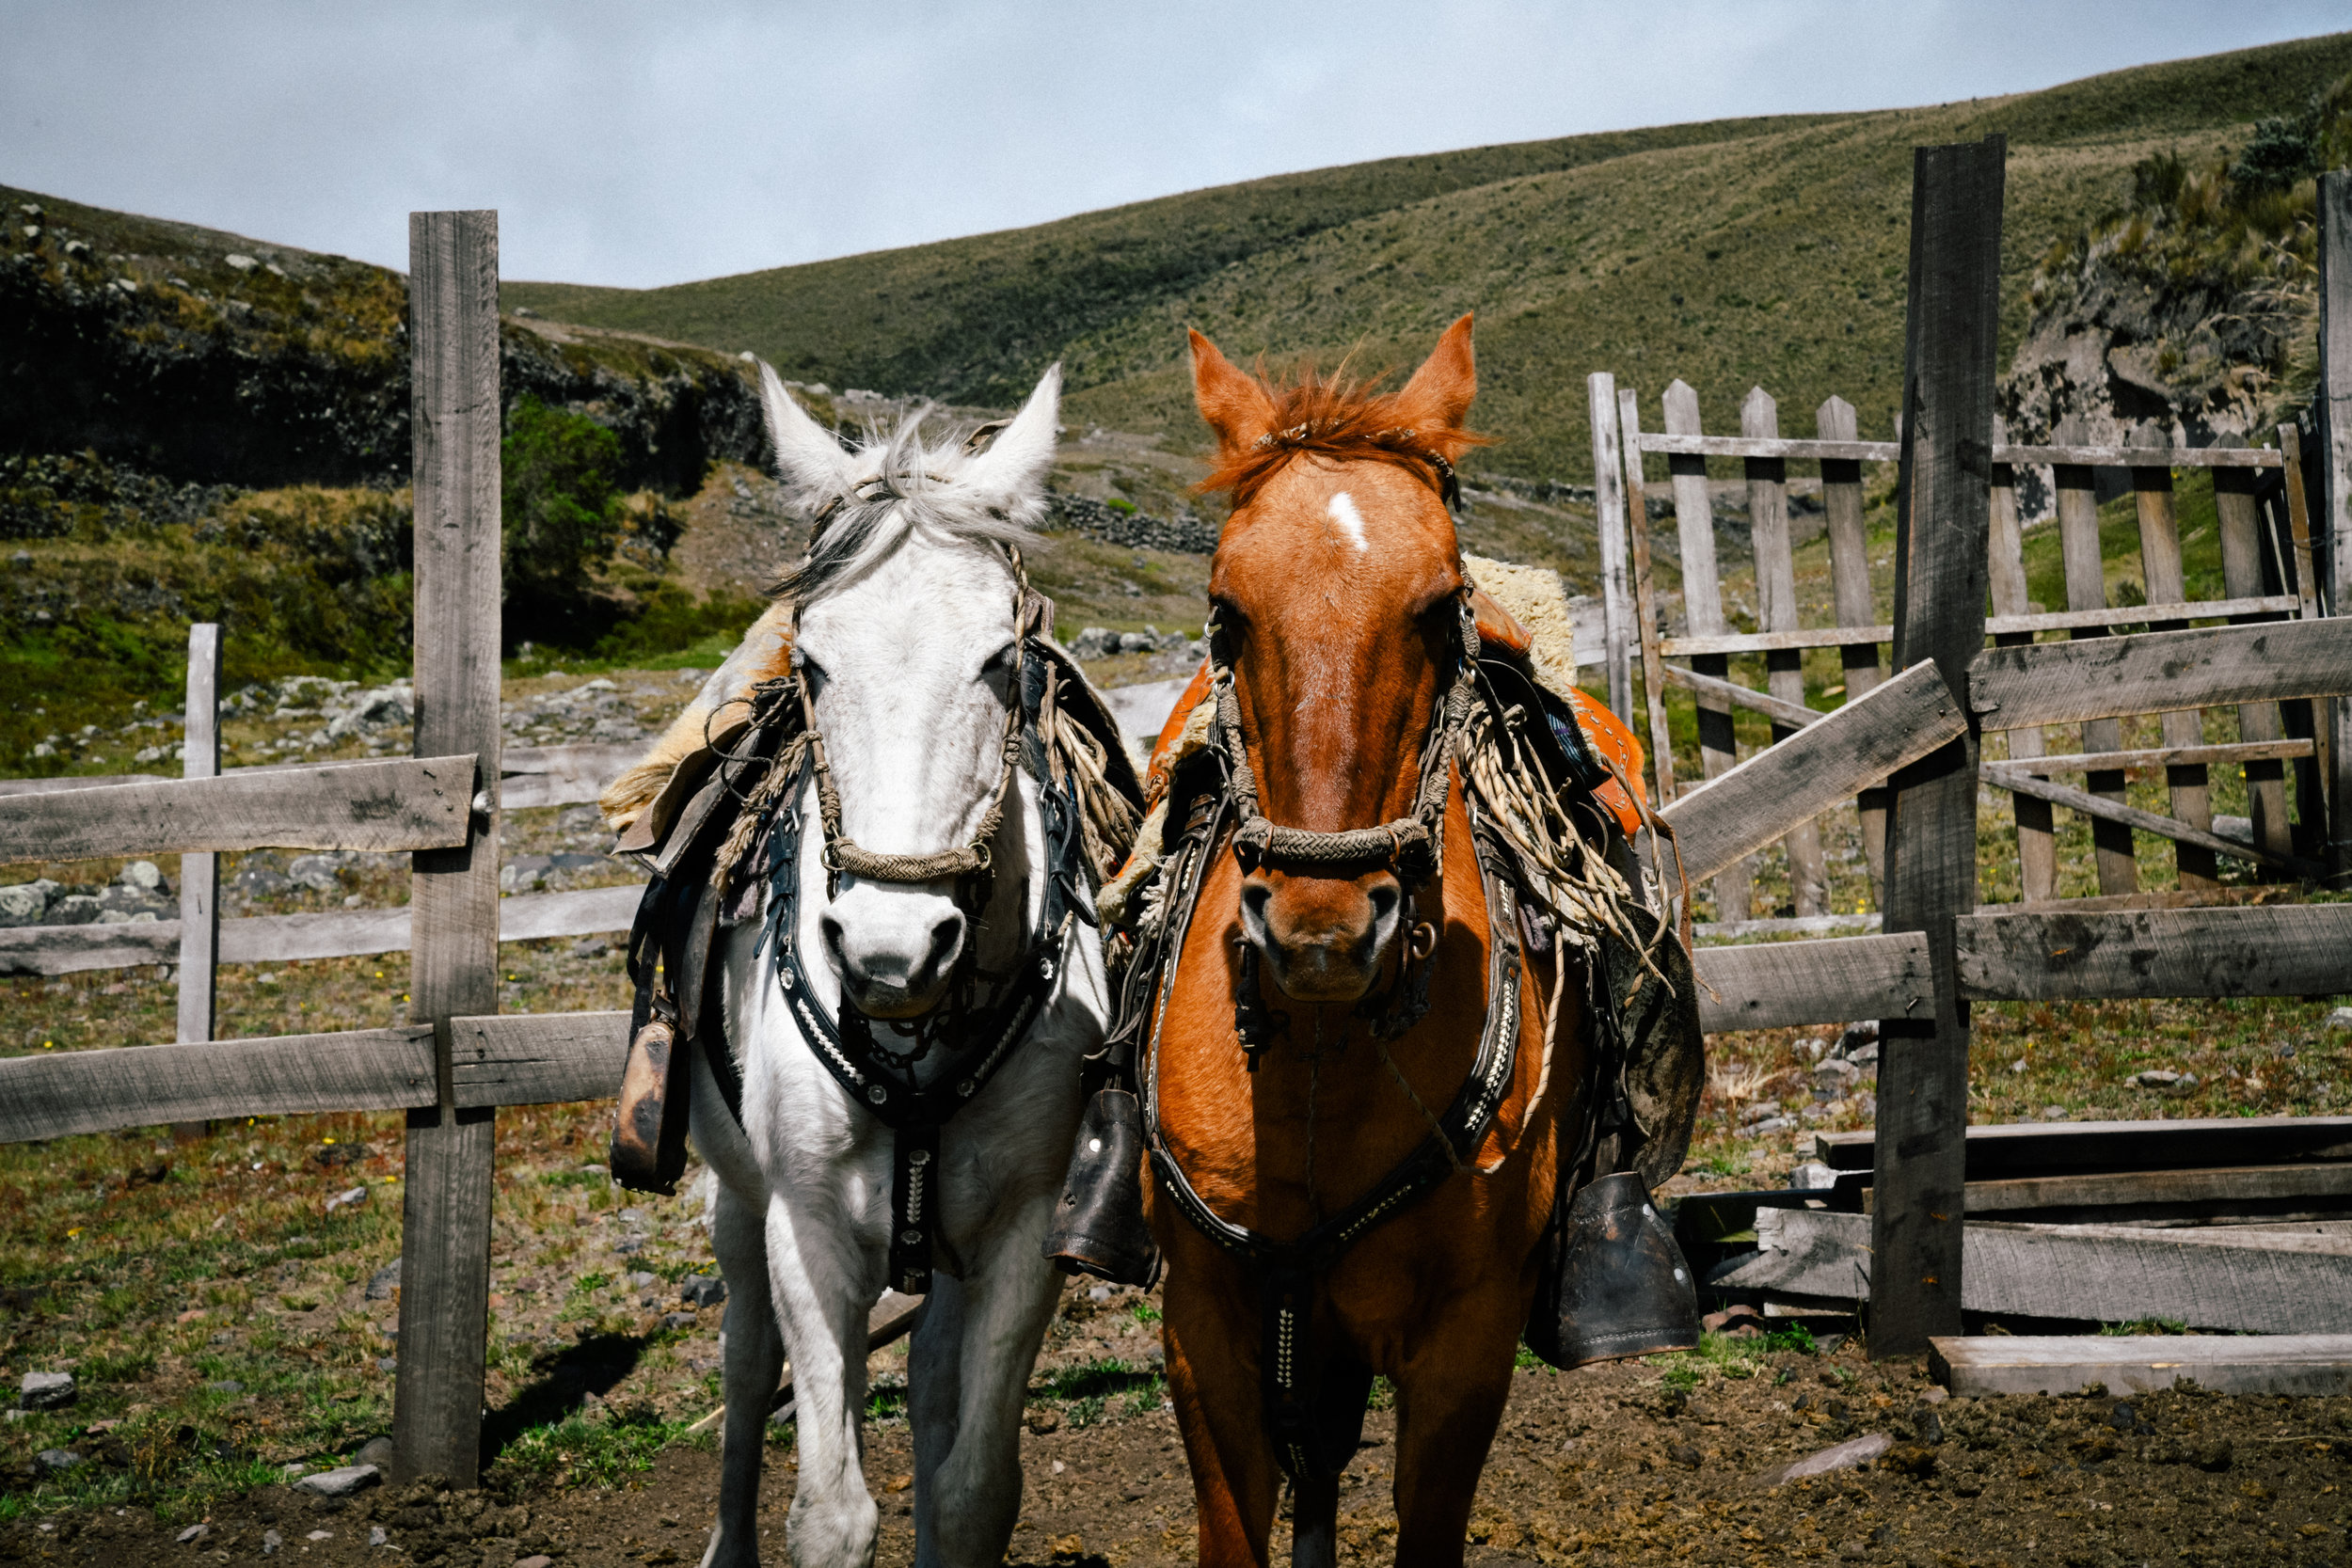 cotopaxi horses ready to go!